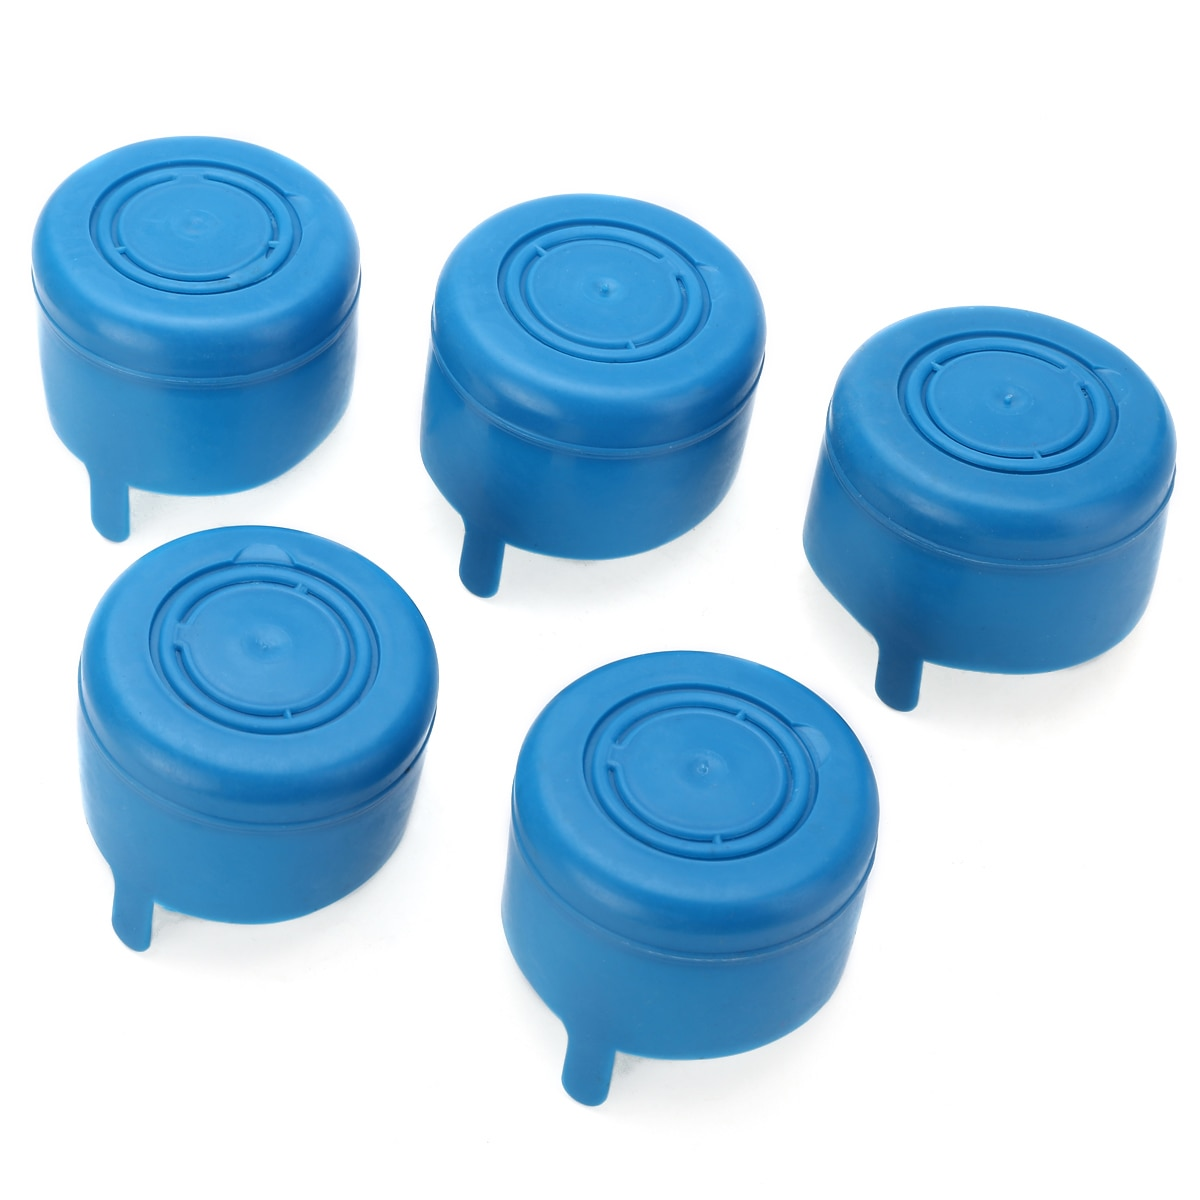 5Pcs Blue 5Gallon Water Bottle Caps Anti Splash Peel Off Tops Snap Replacement Water Bottle Snap Cap For 18.9L Water Bottle Cup